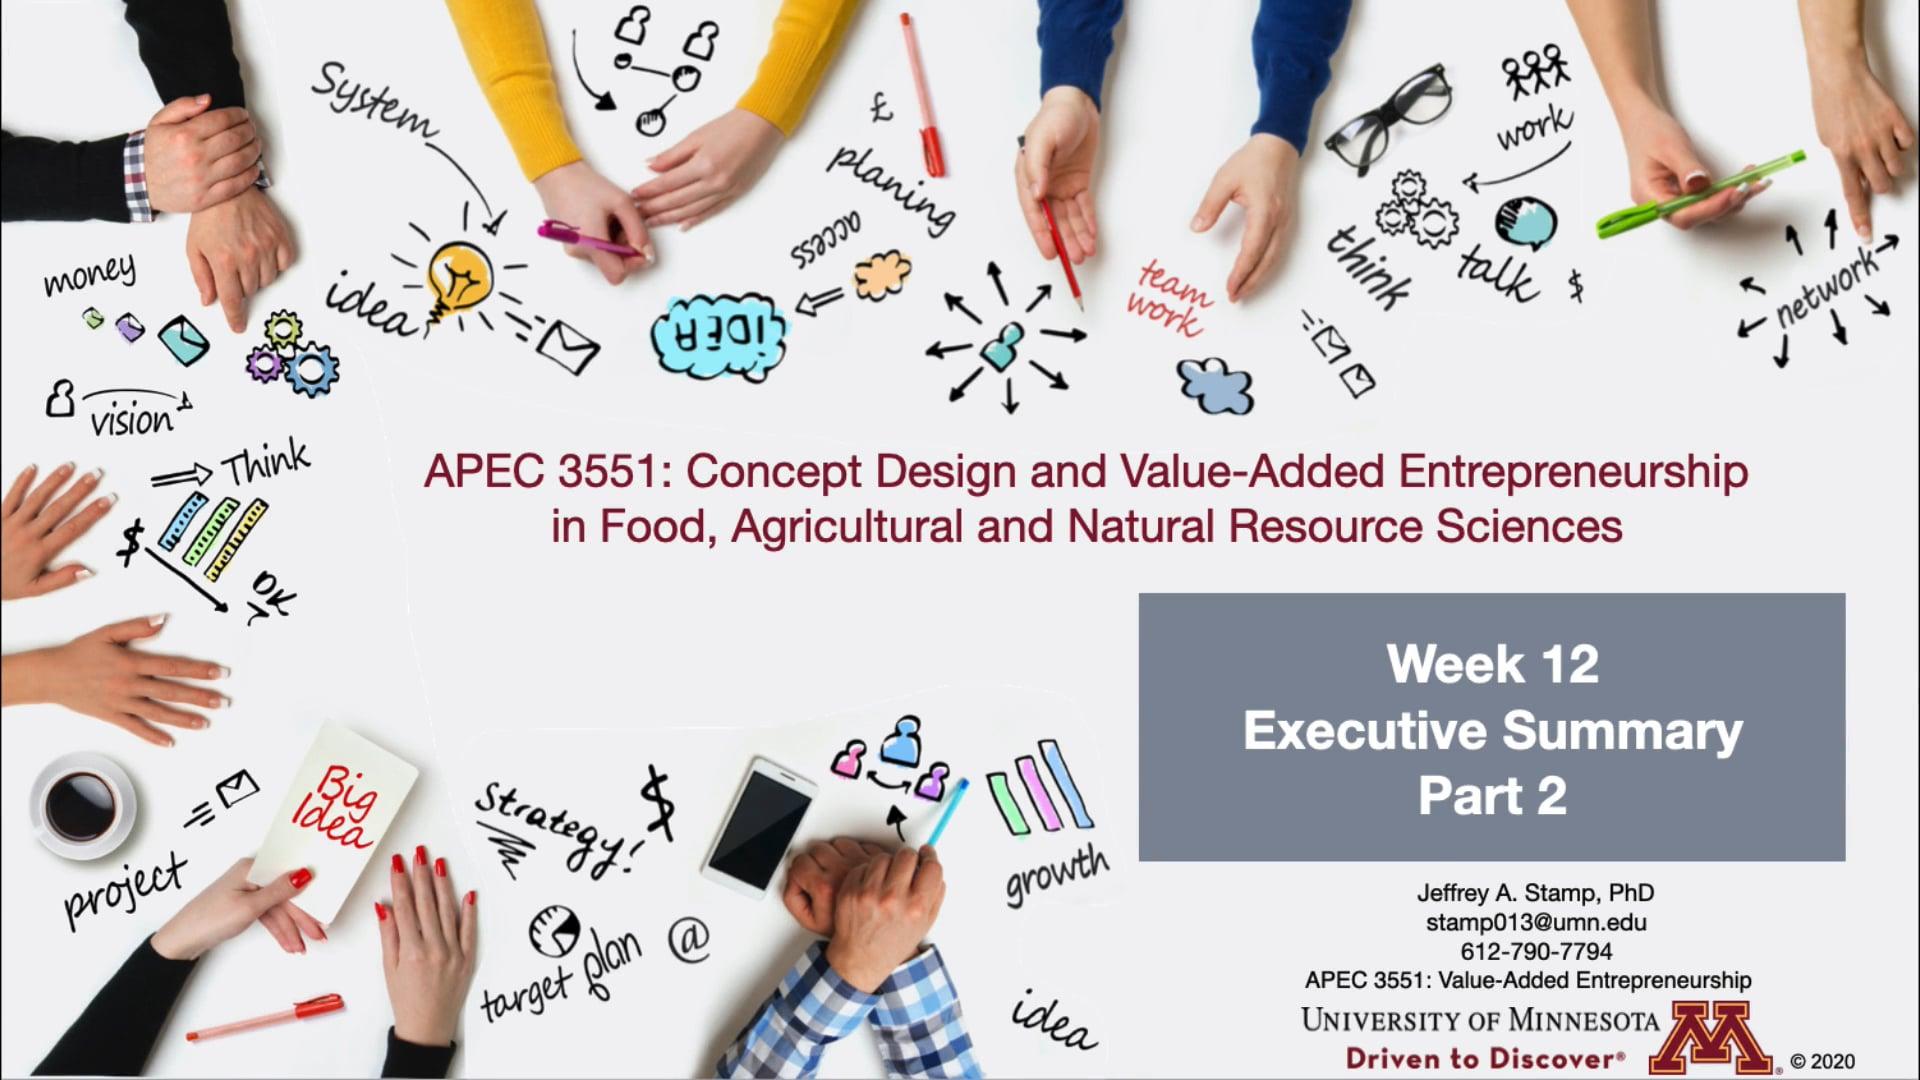 APEC 3551 F20 Week 12 Video 1 Part 2 Executive Summary